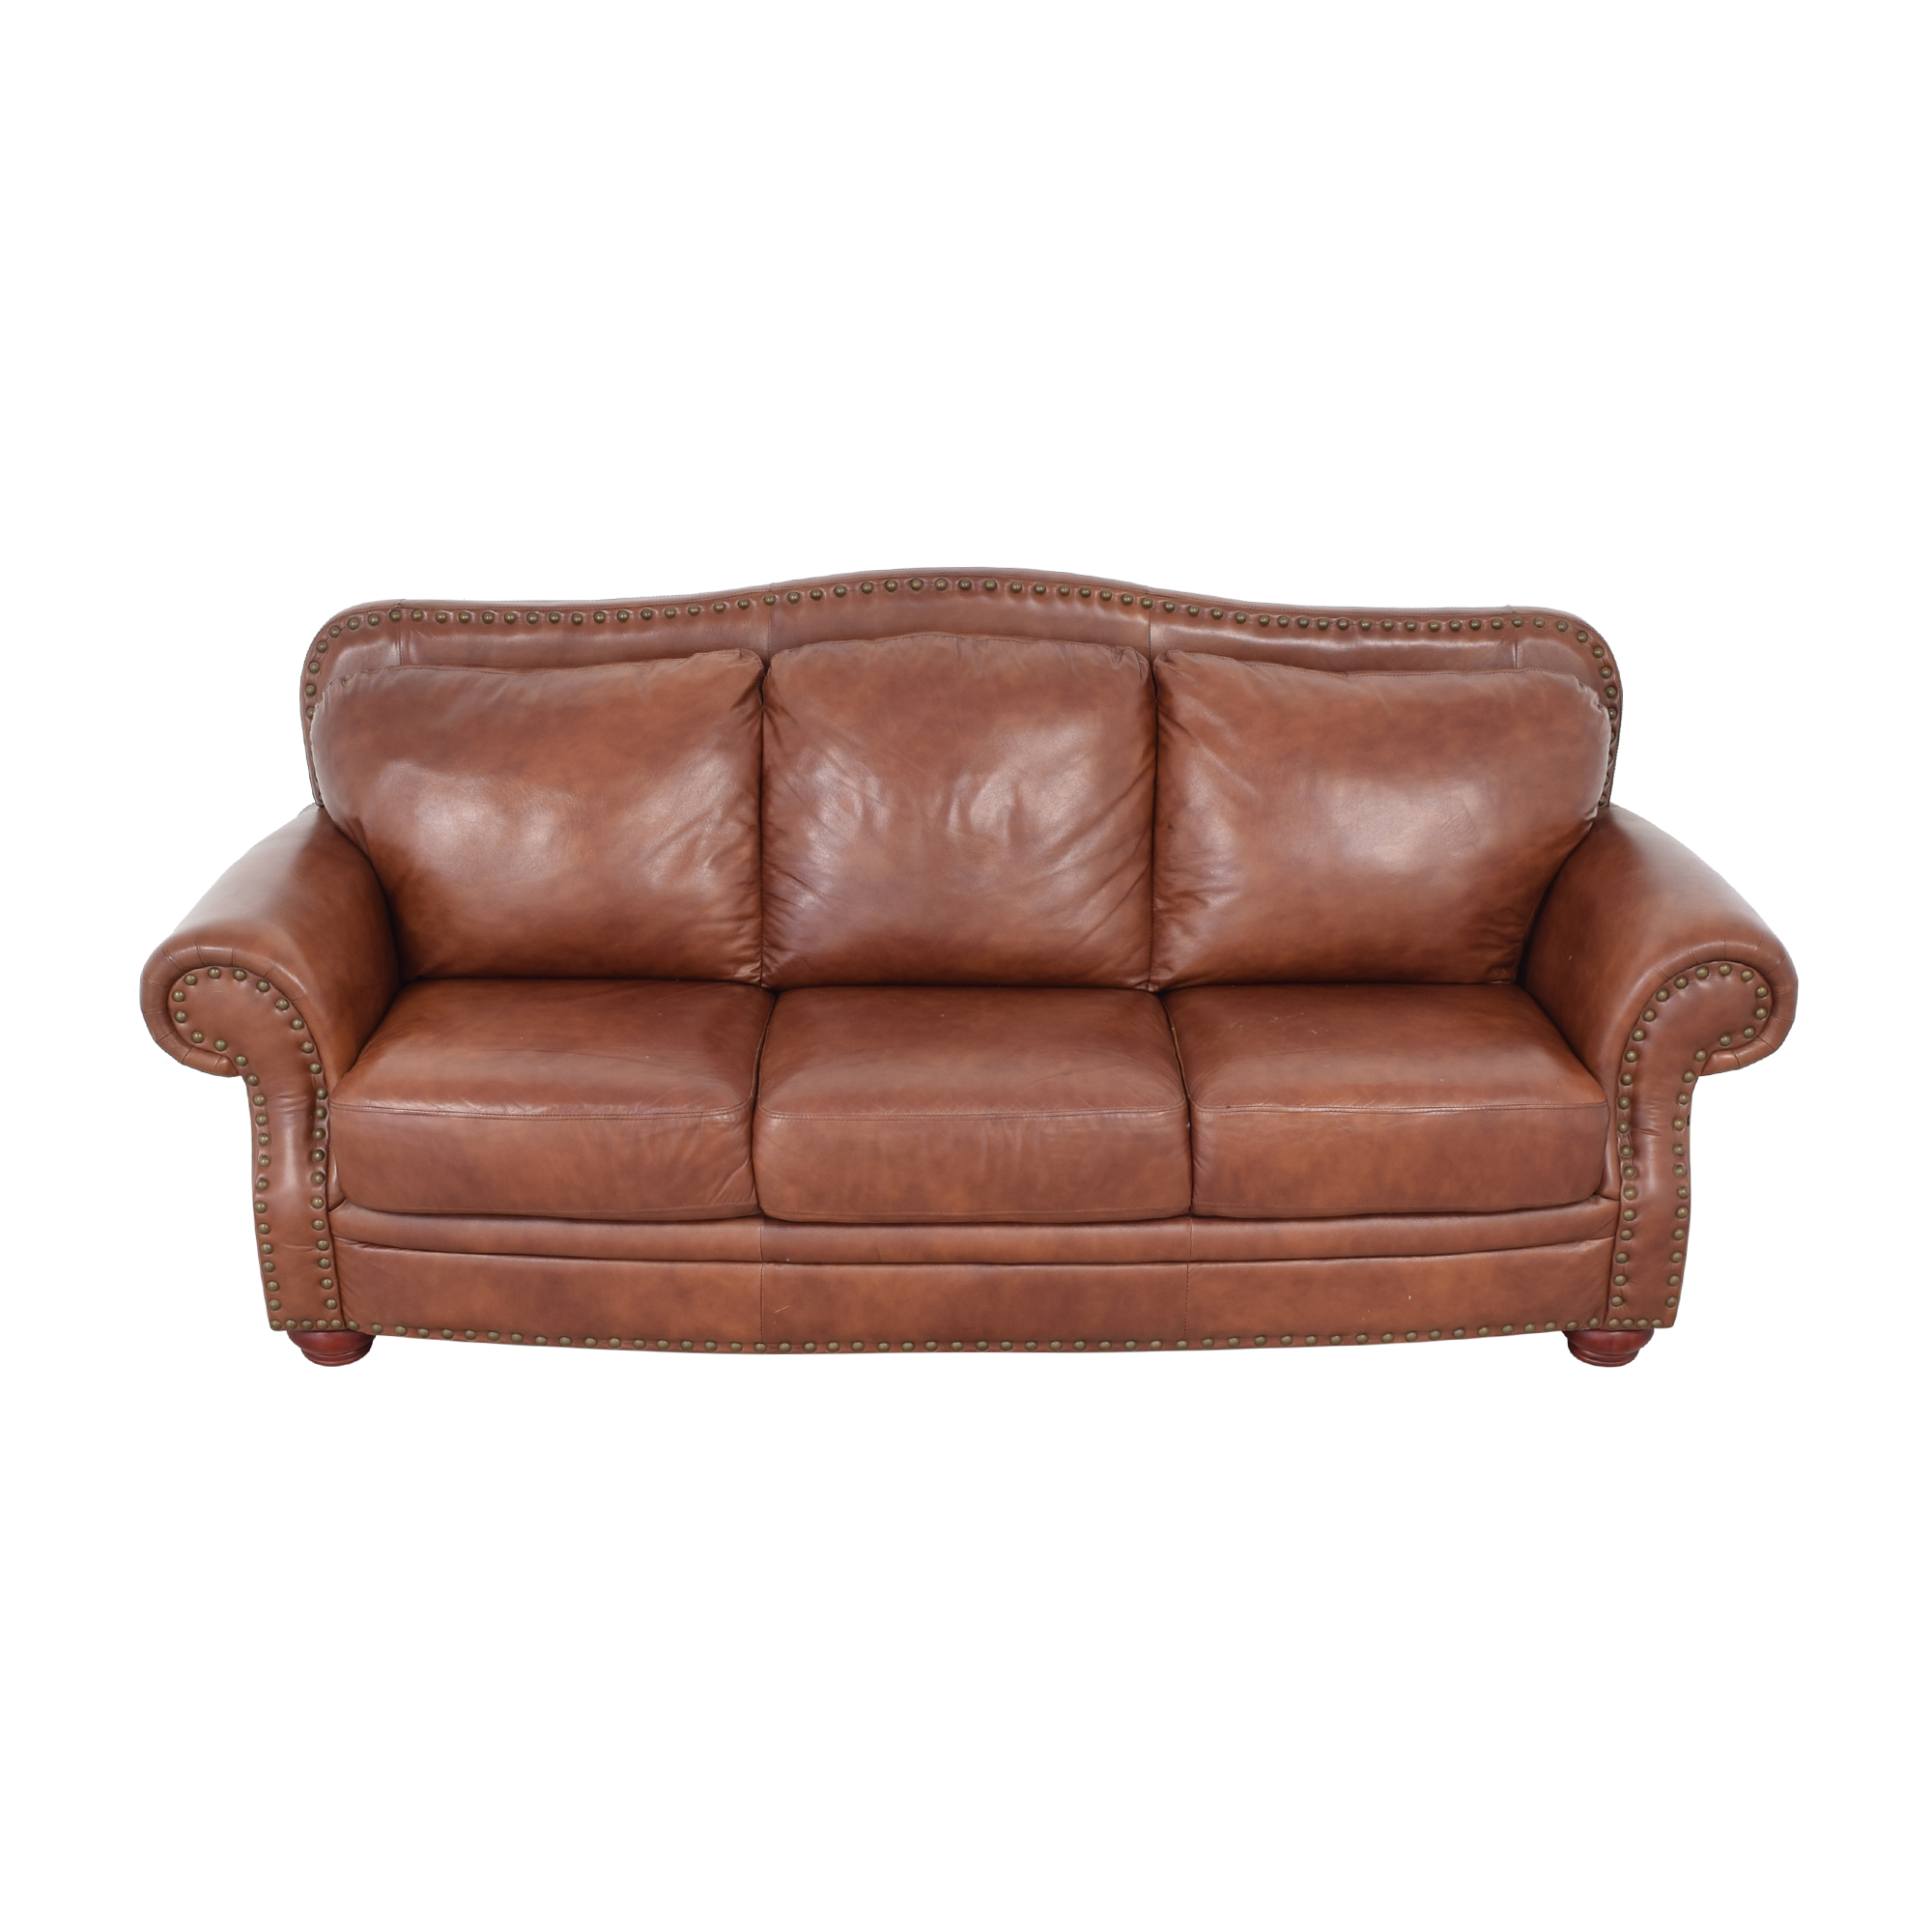 Rolled Arm Camel Back Sofa Sofas